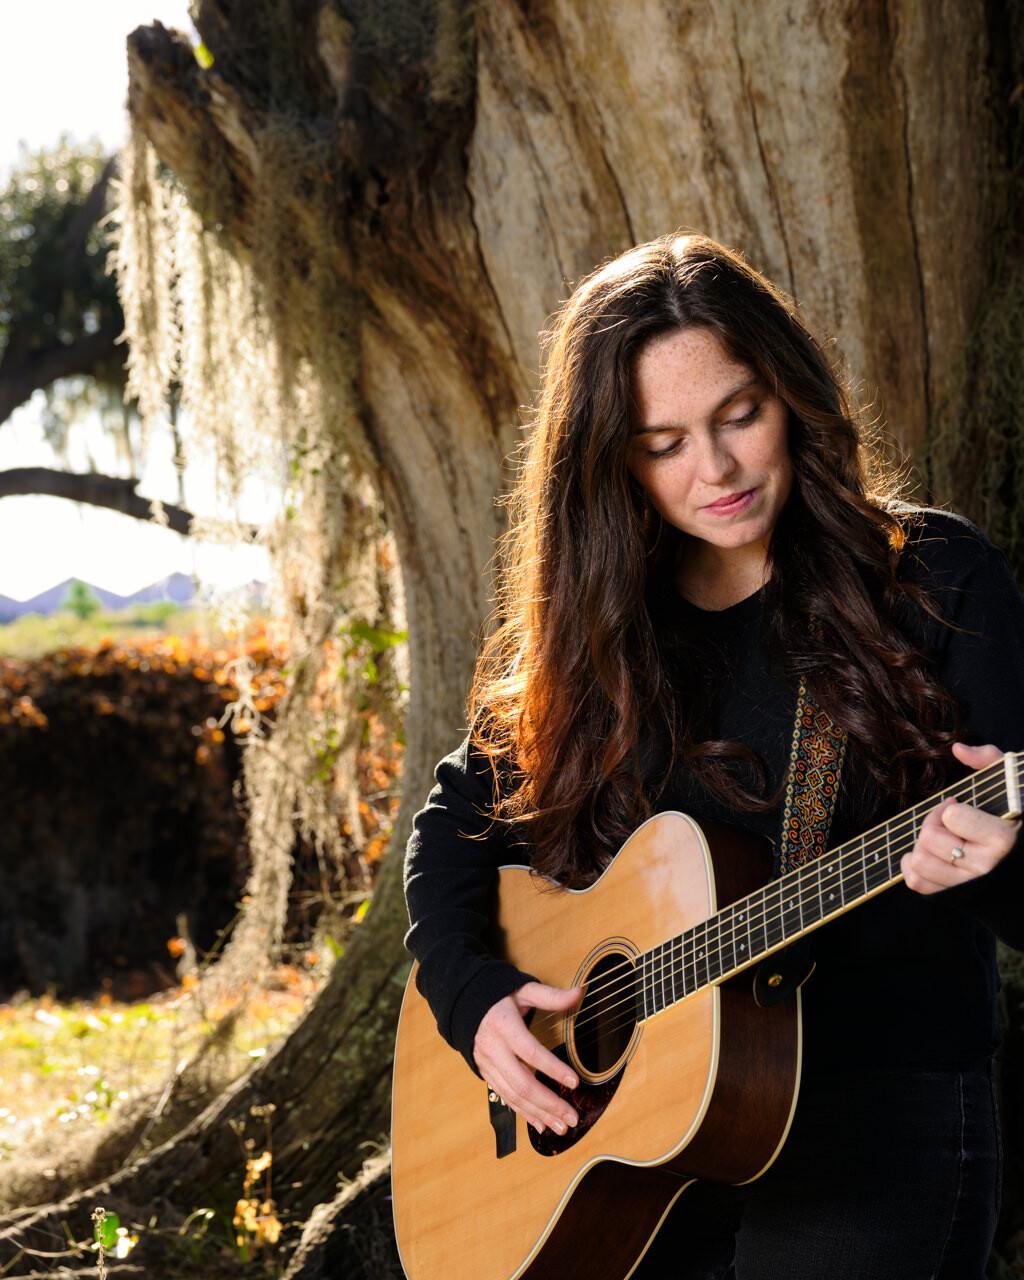 Layla Brisbois singer-songwriter based in orlando strumming her guitar